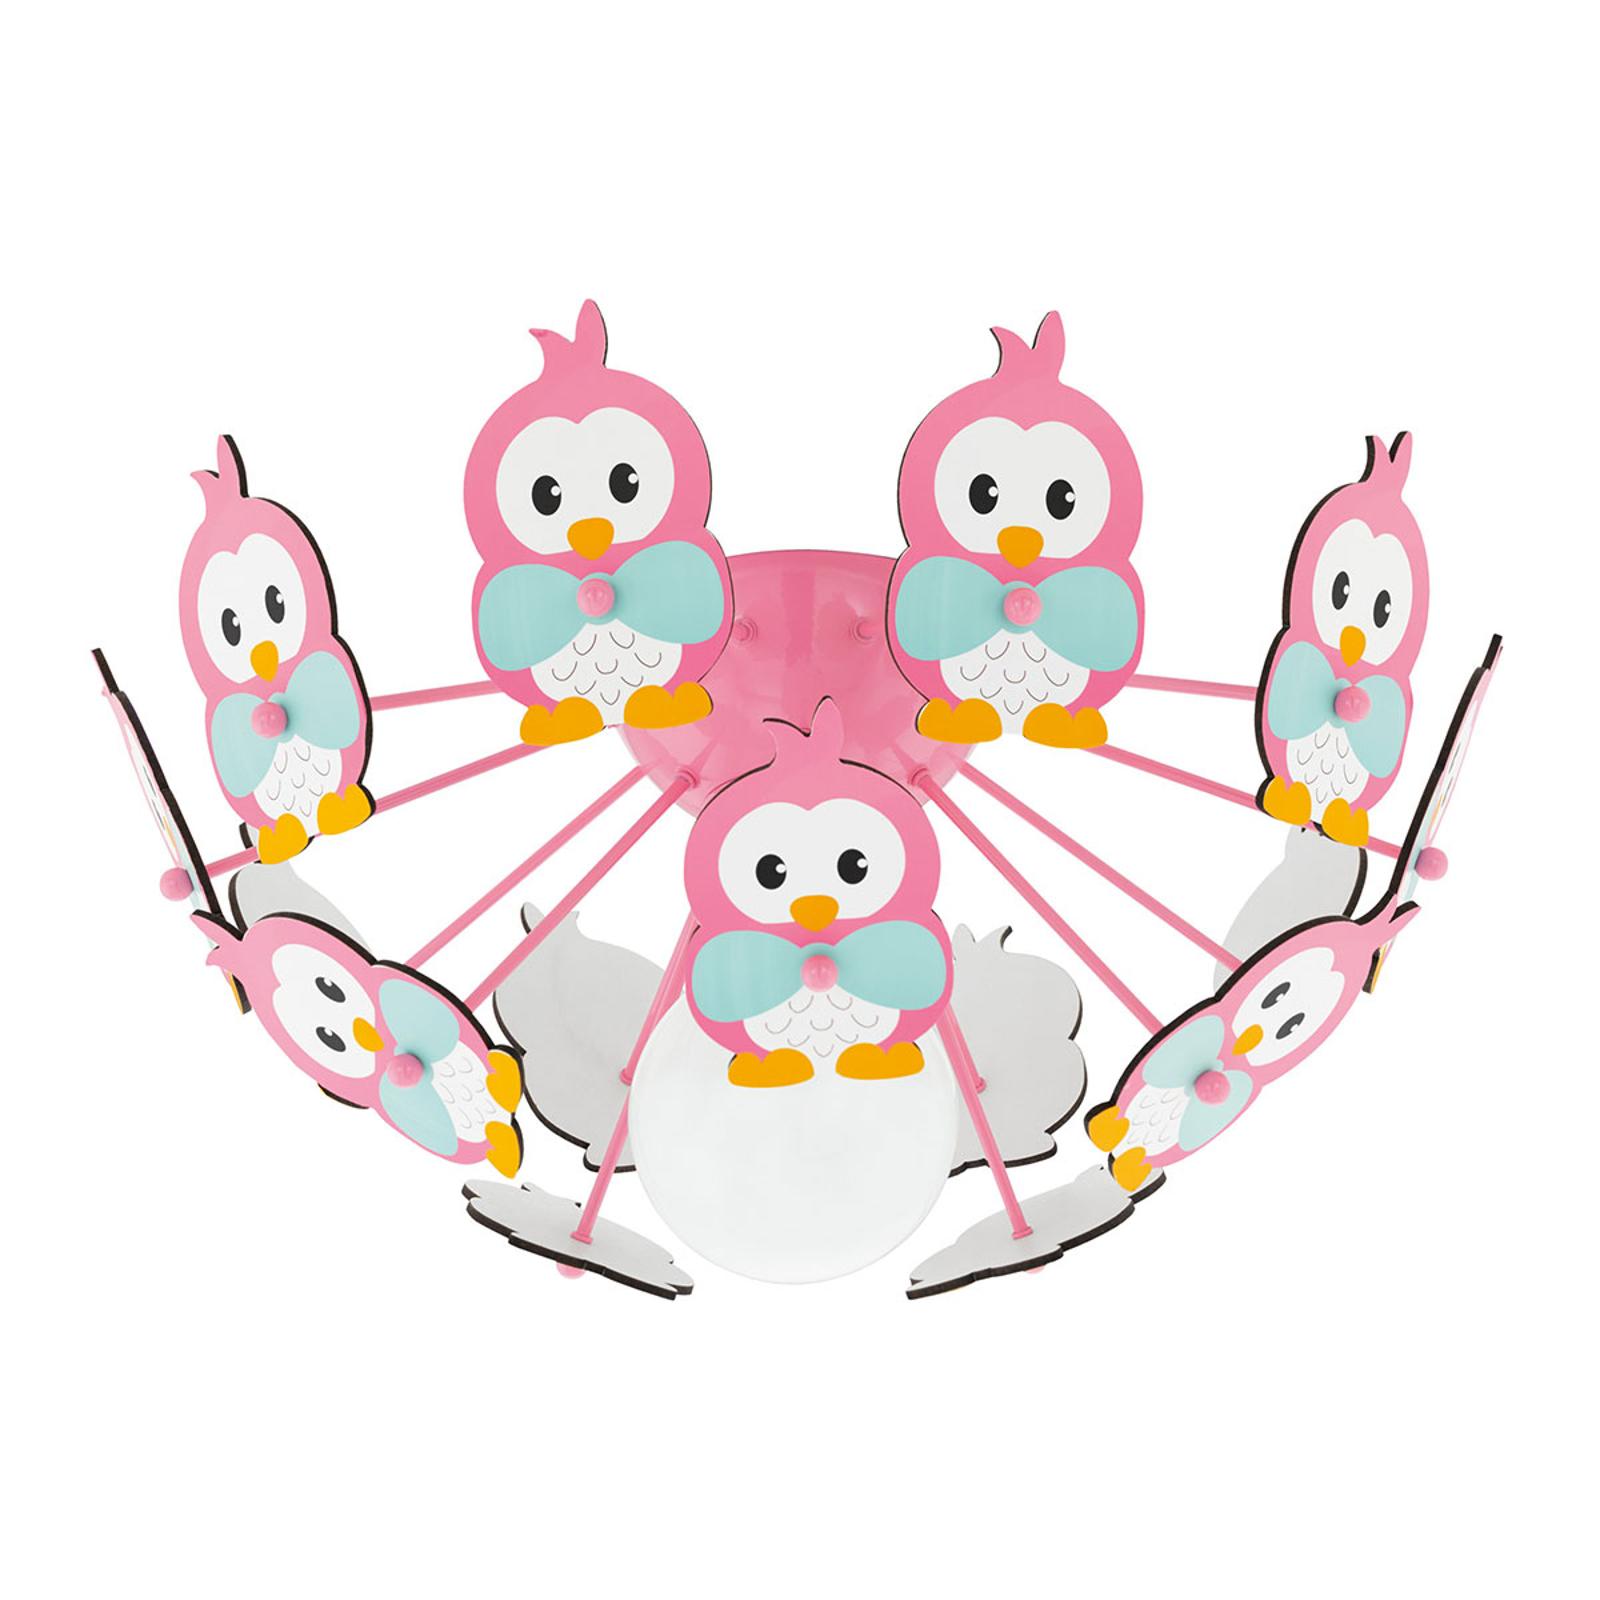 Lampa sufitowa Viki 2 z pingwinami różowa